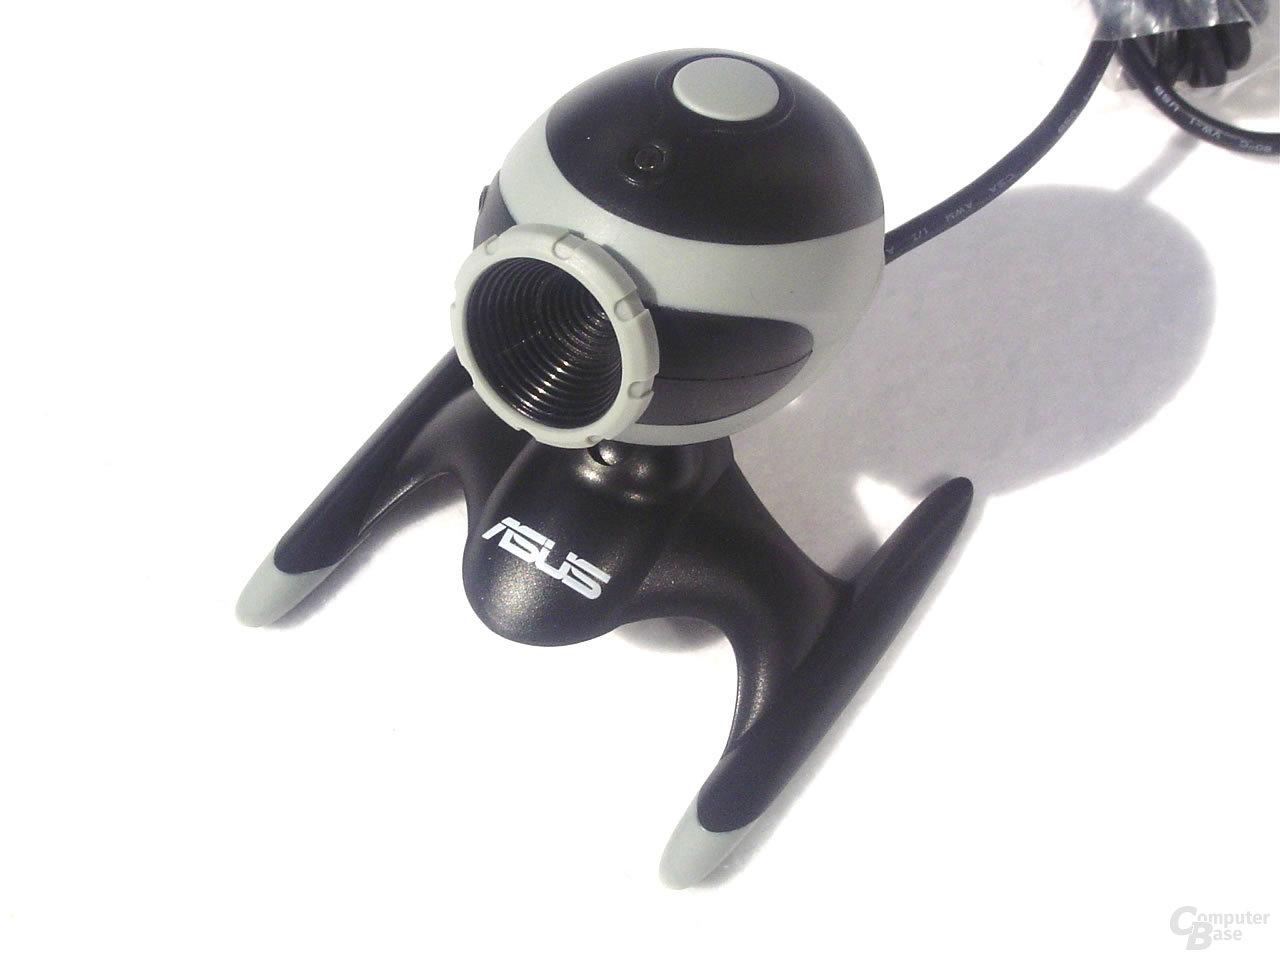 Asus-Webcam